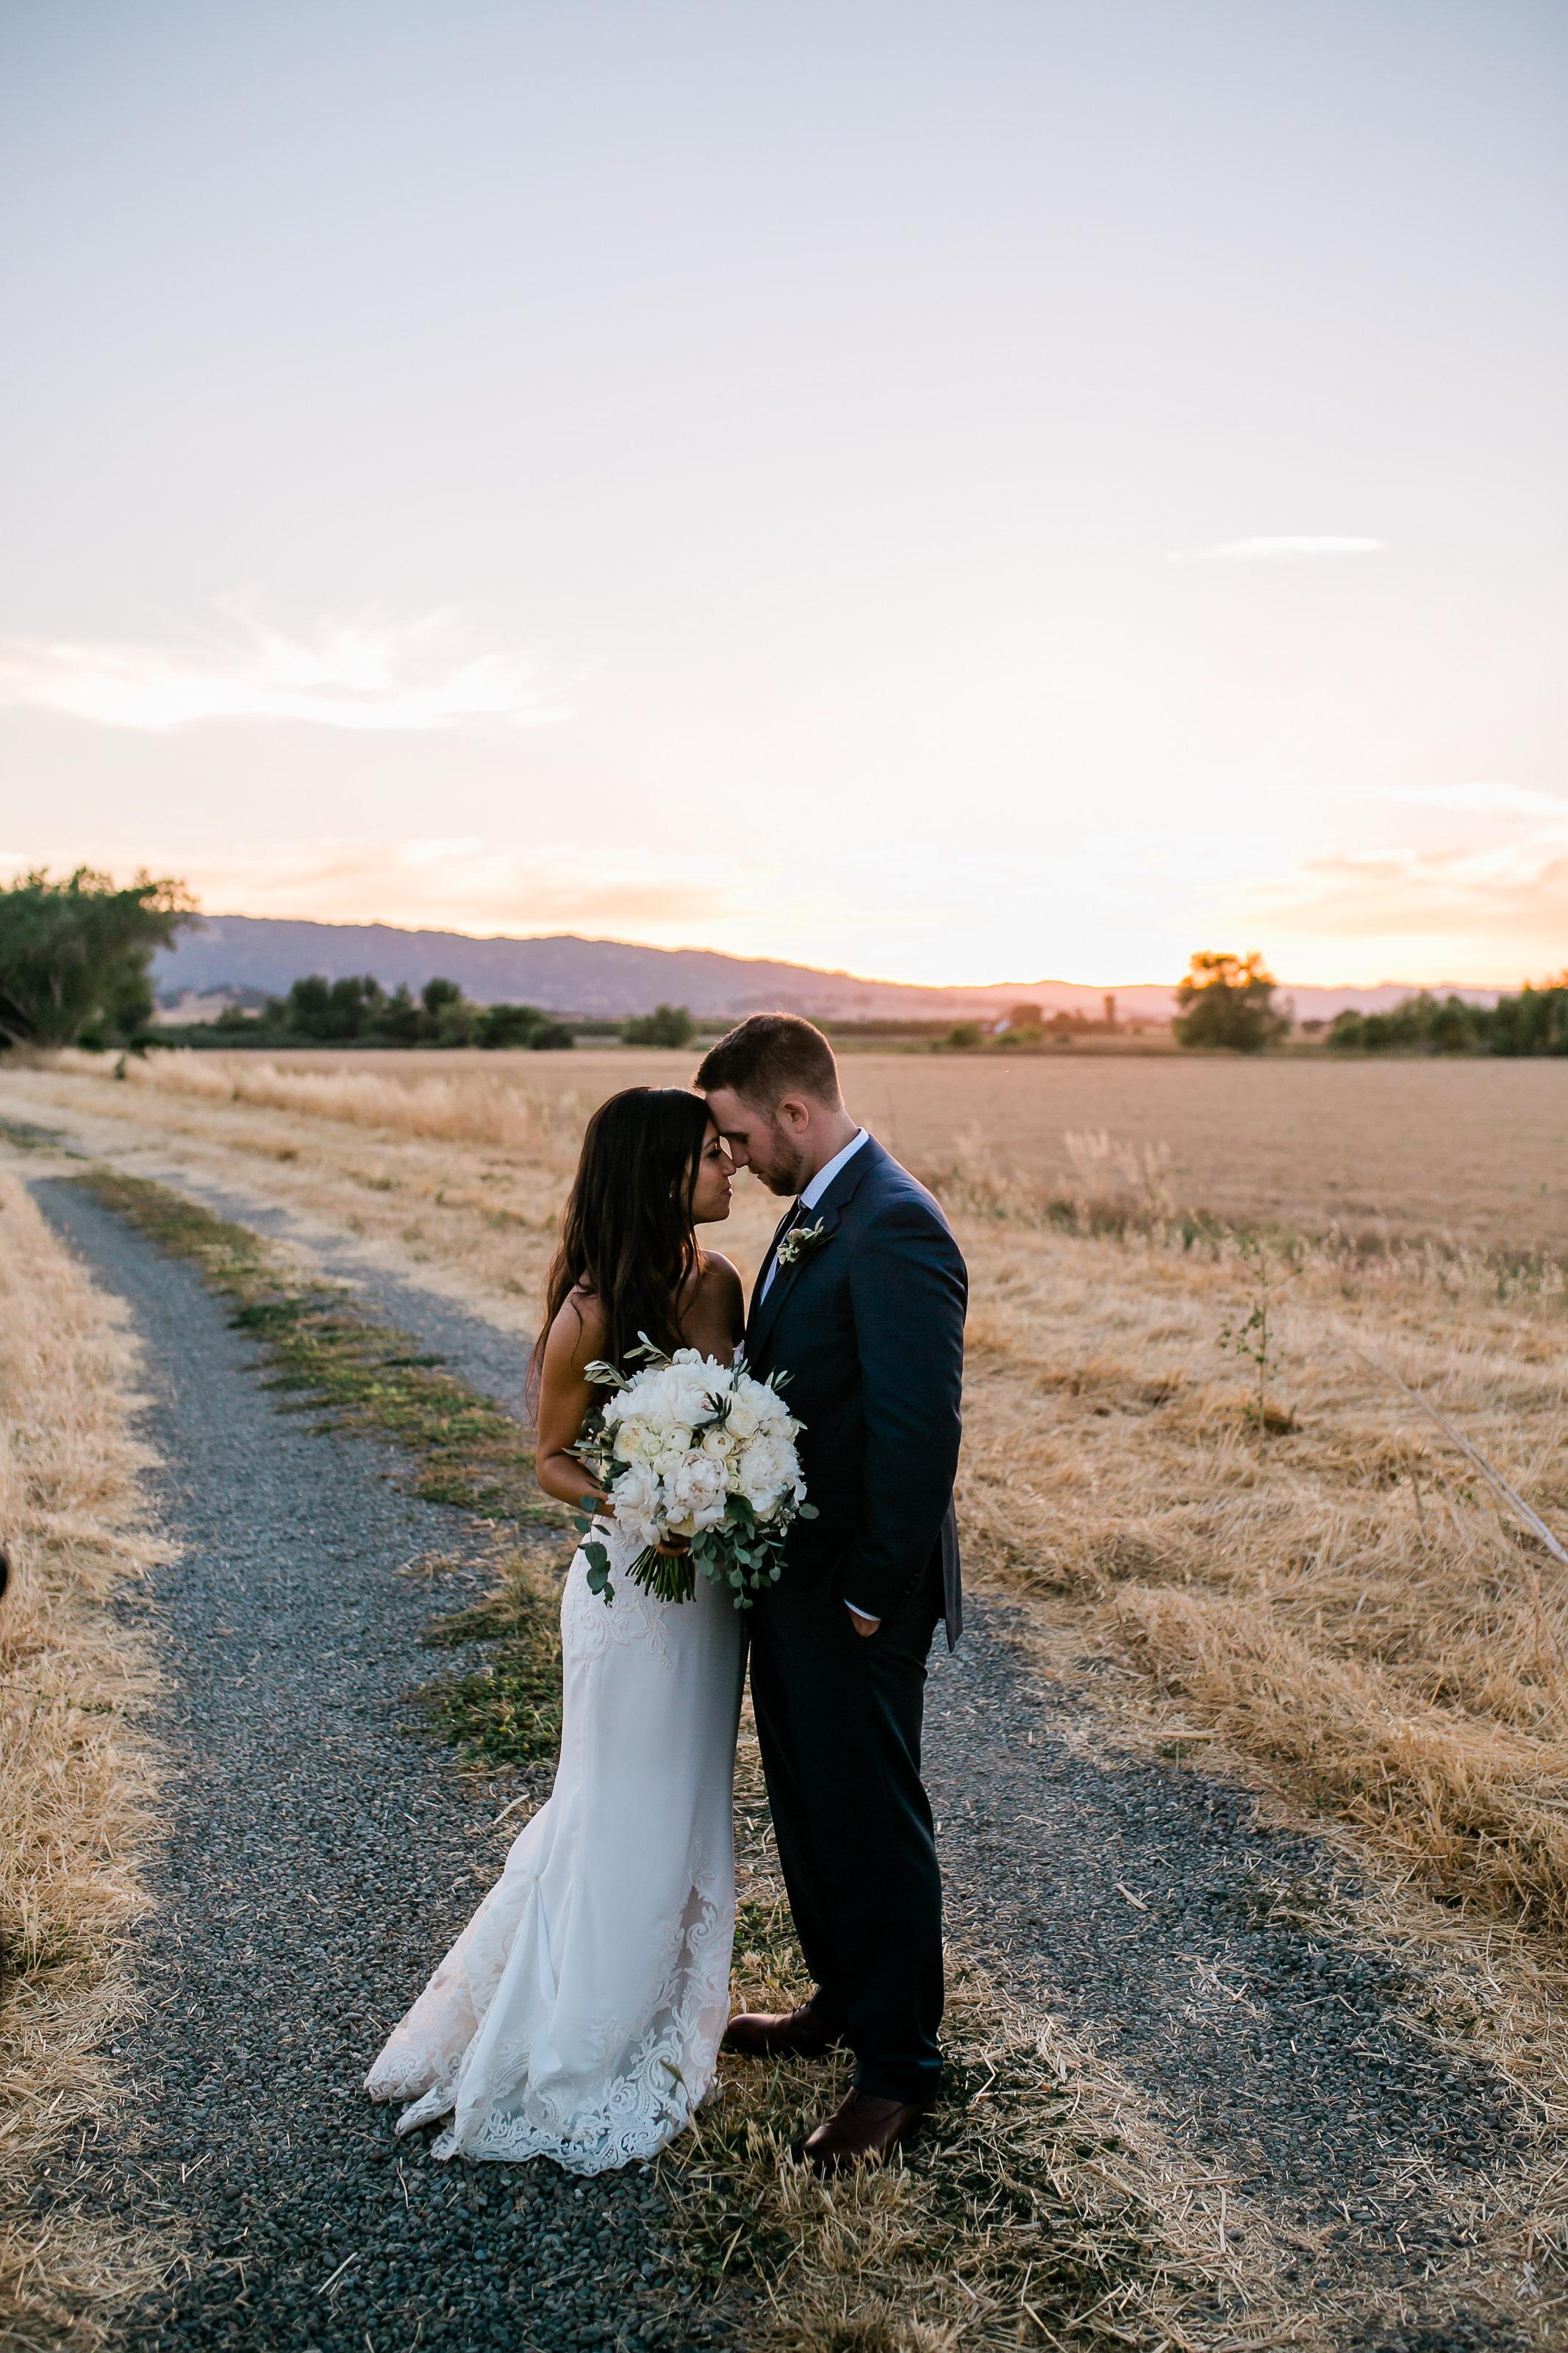 Park Winters Summer Wedding | Country Wedding | Farm Wedding | Bride and Groom Portrait